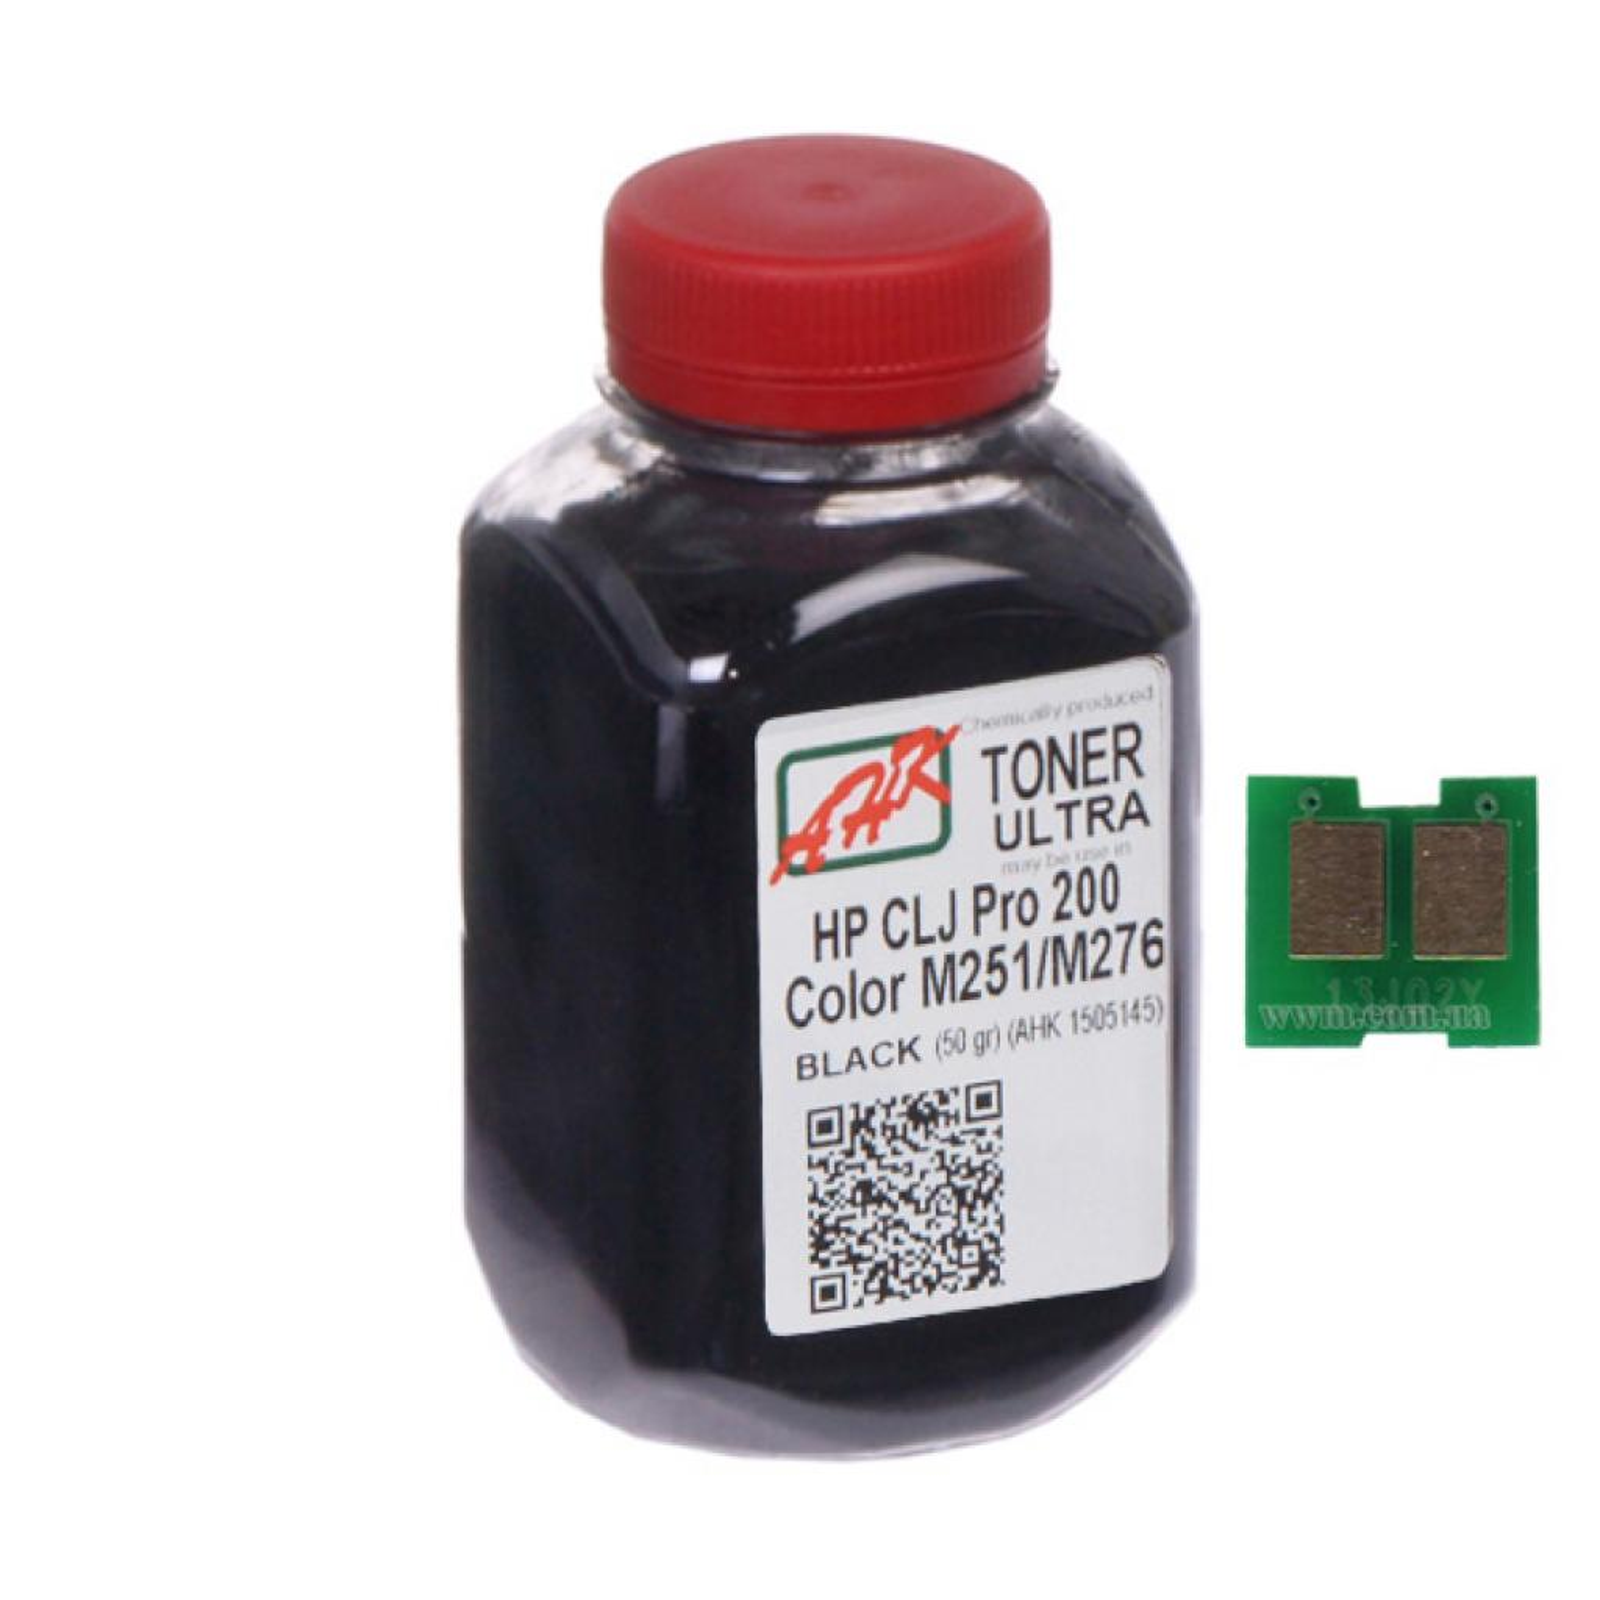 Тонер AHK HP CLJ Pro 200/M251/M276n (131A) Black +chip (1505157)